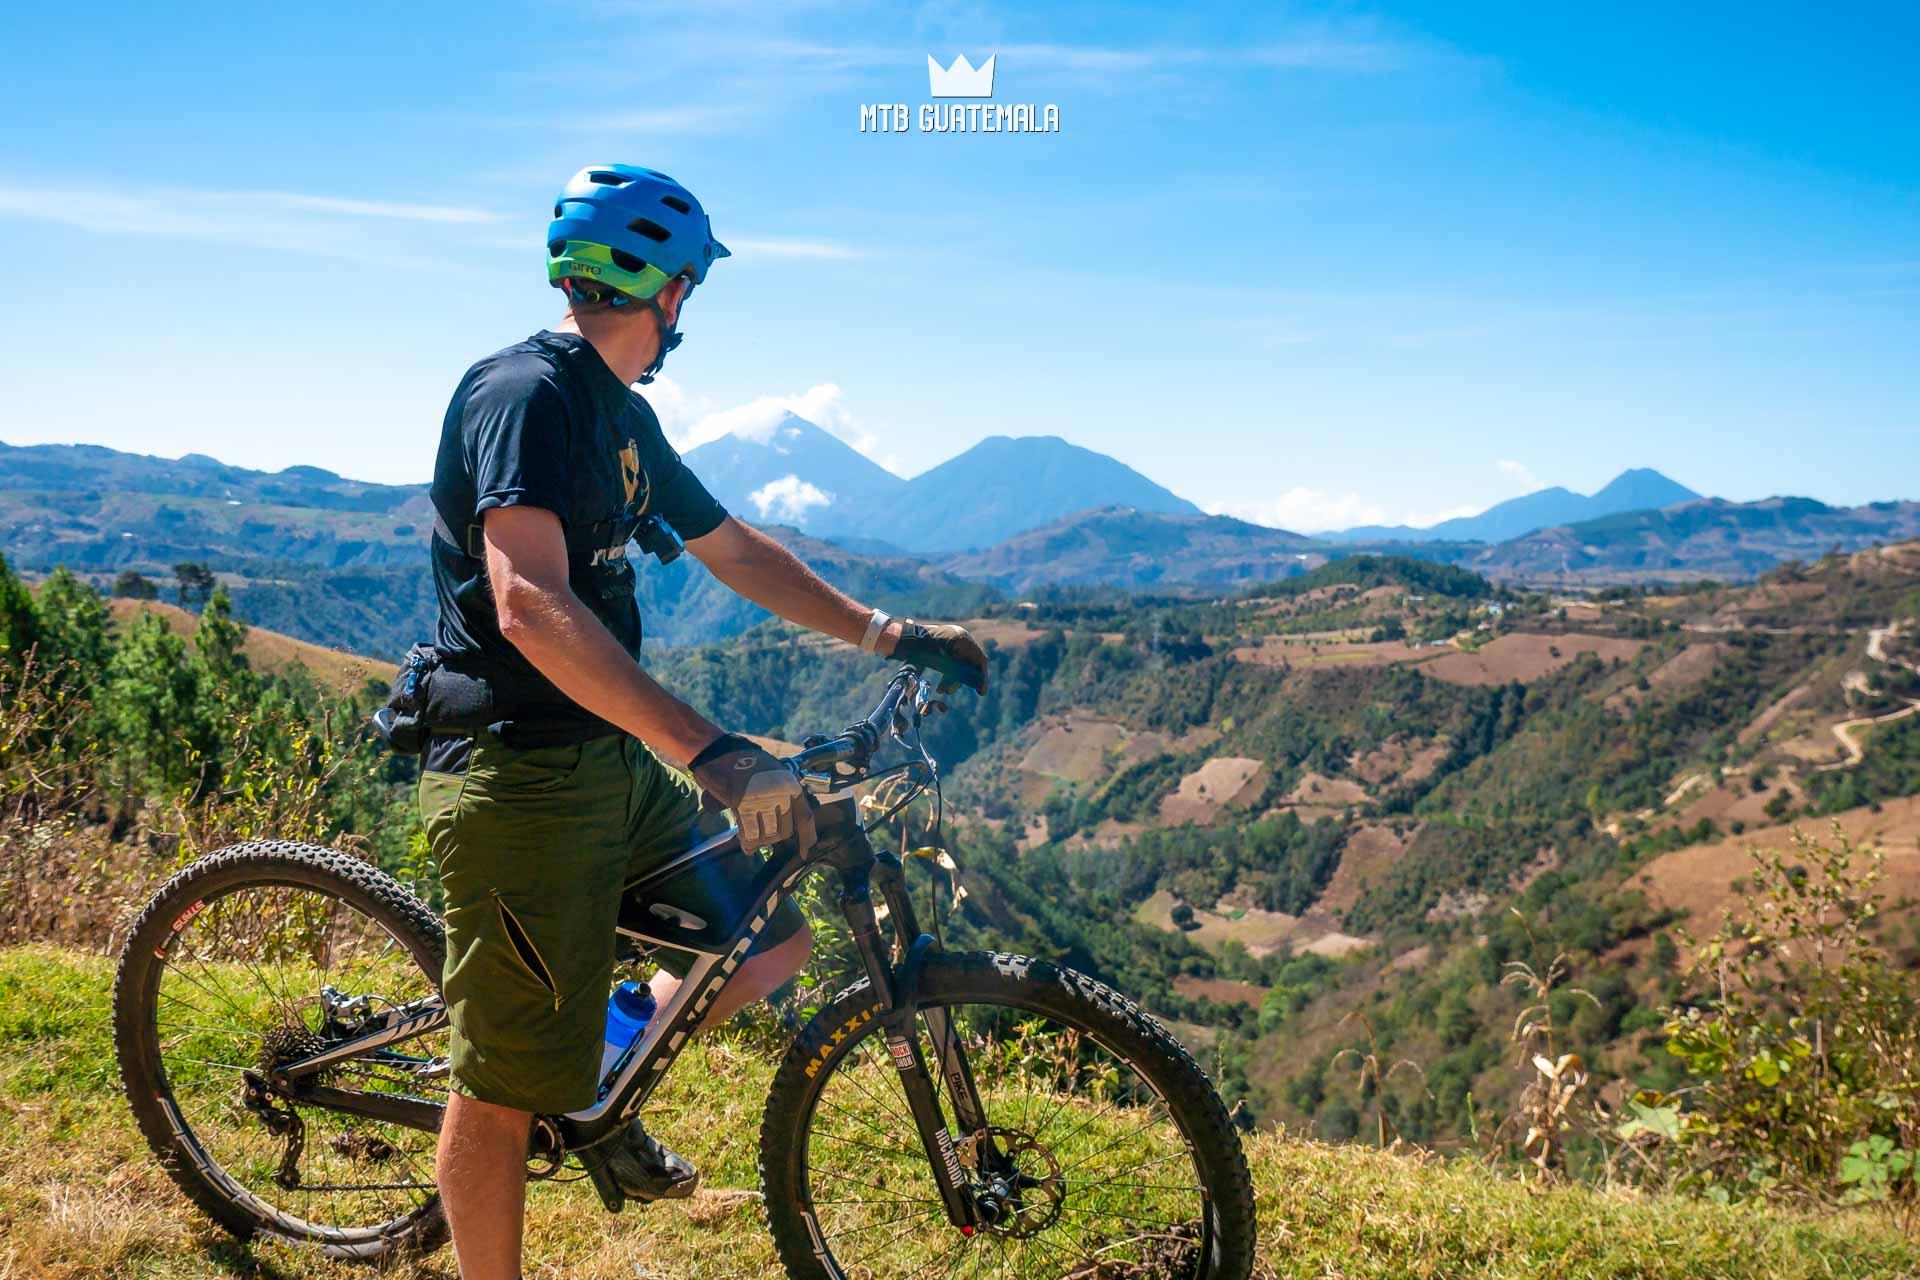 MTB-GUA_181226-41-G7.dng - Mountain Biking in Tecpán Guatemala